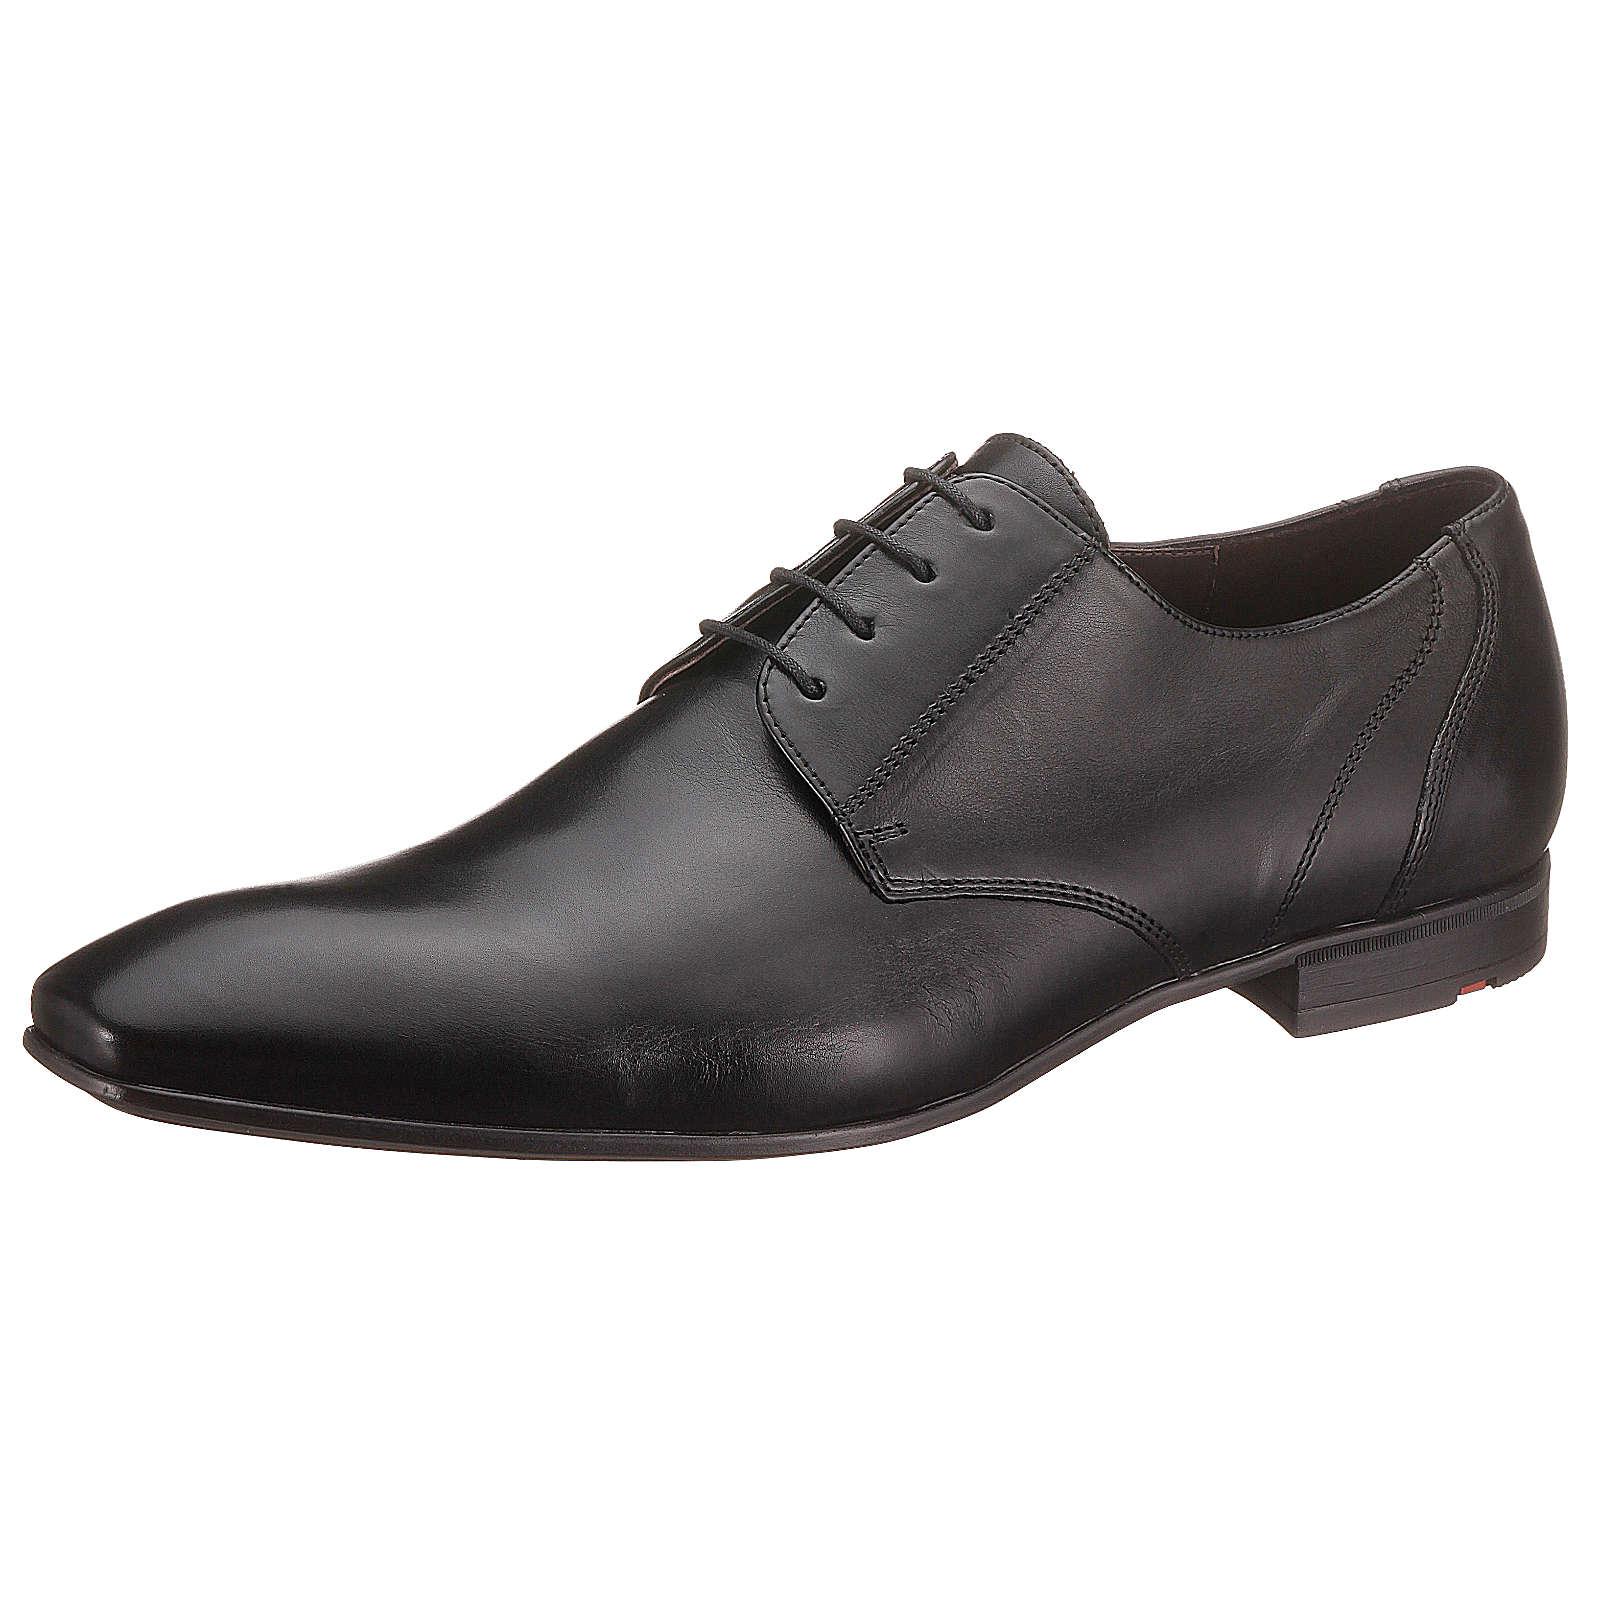 LLOYD Business Schuhe schwarz Herren Gr. 43